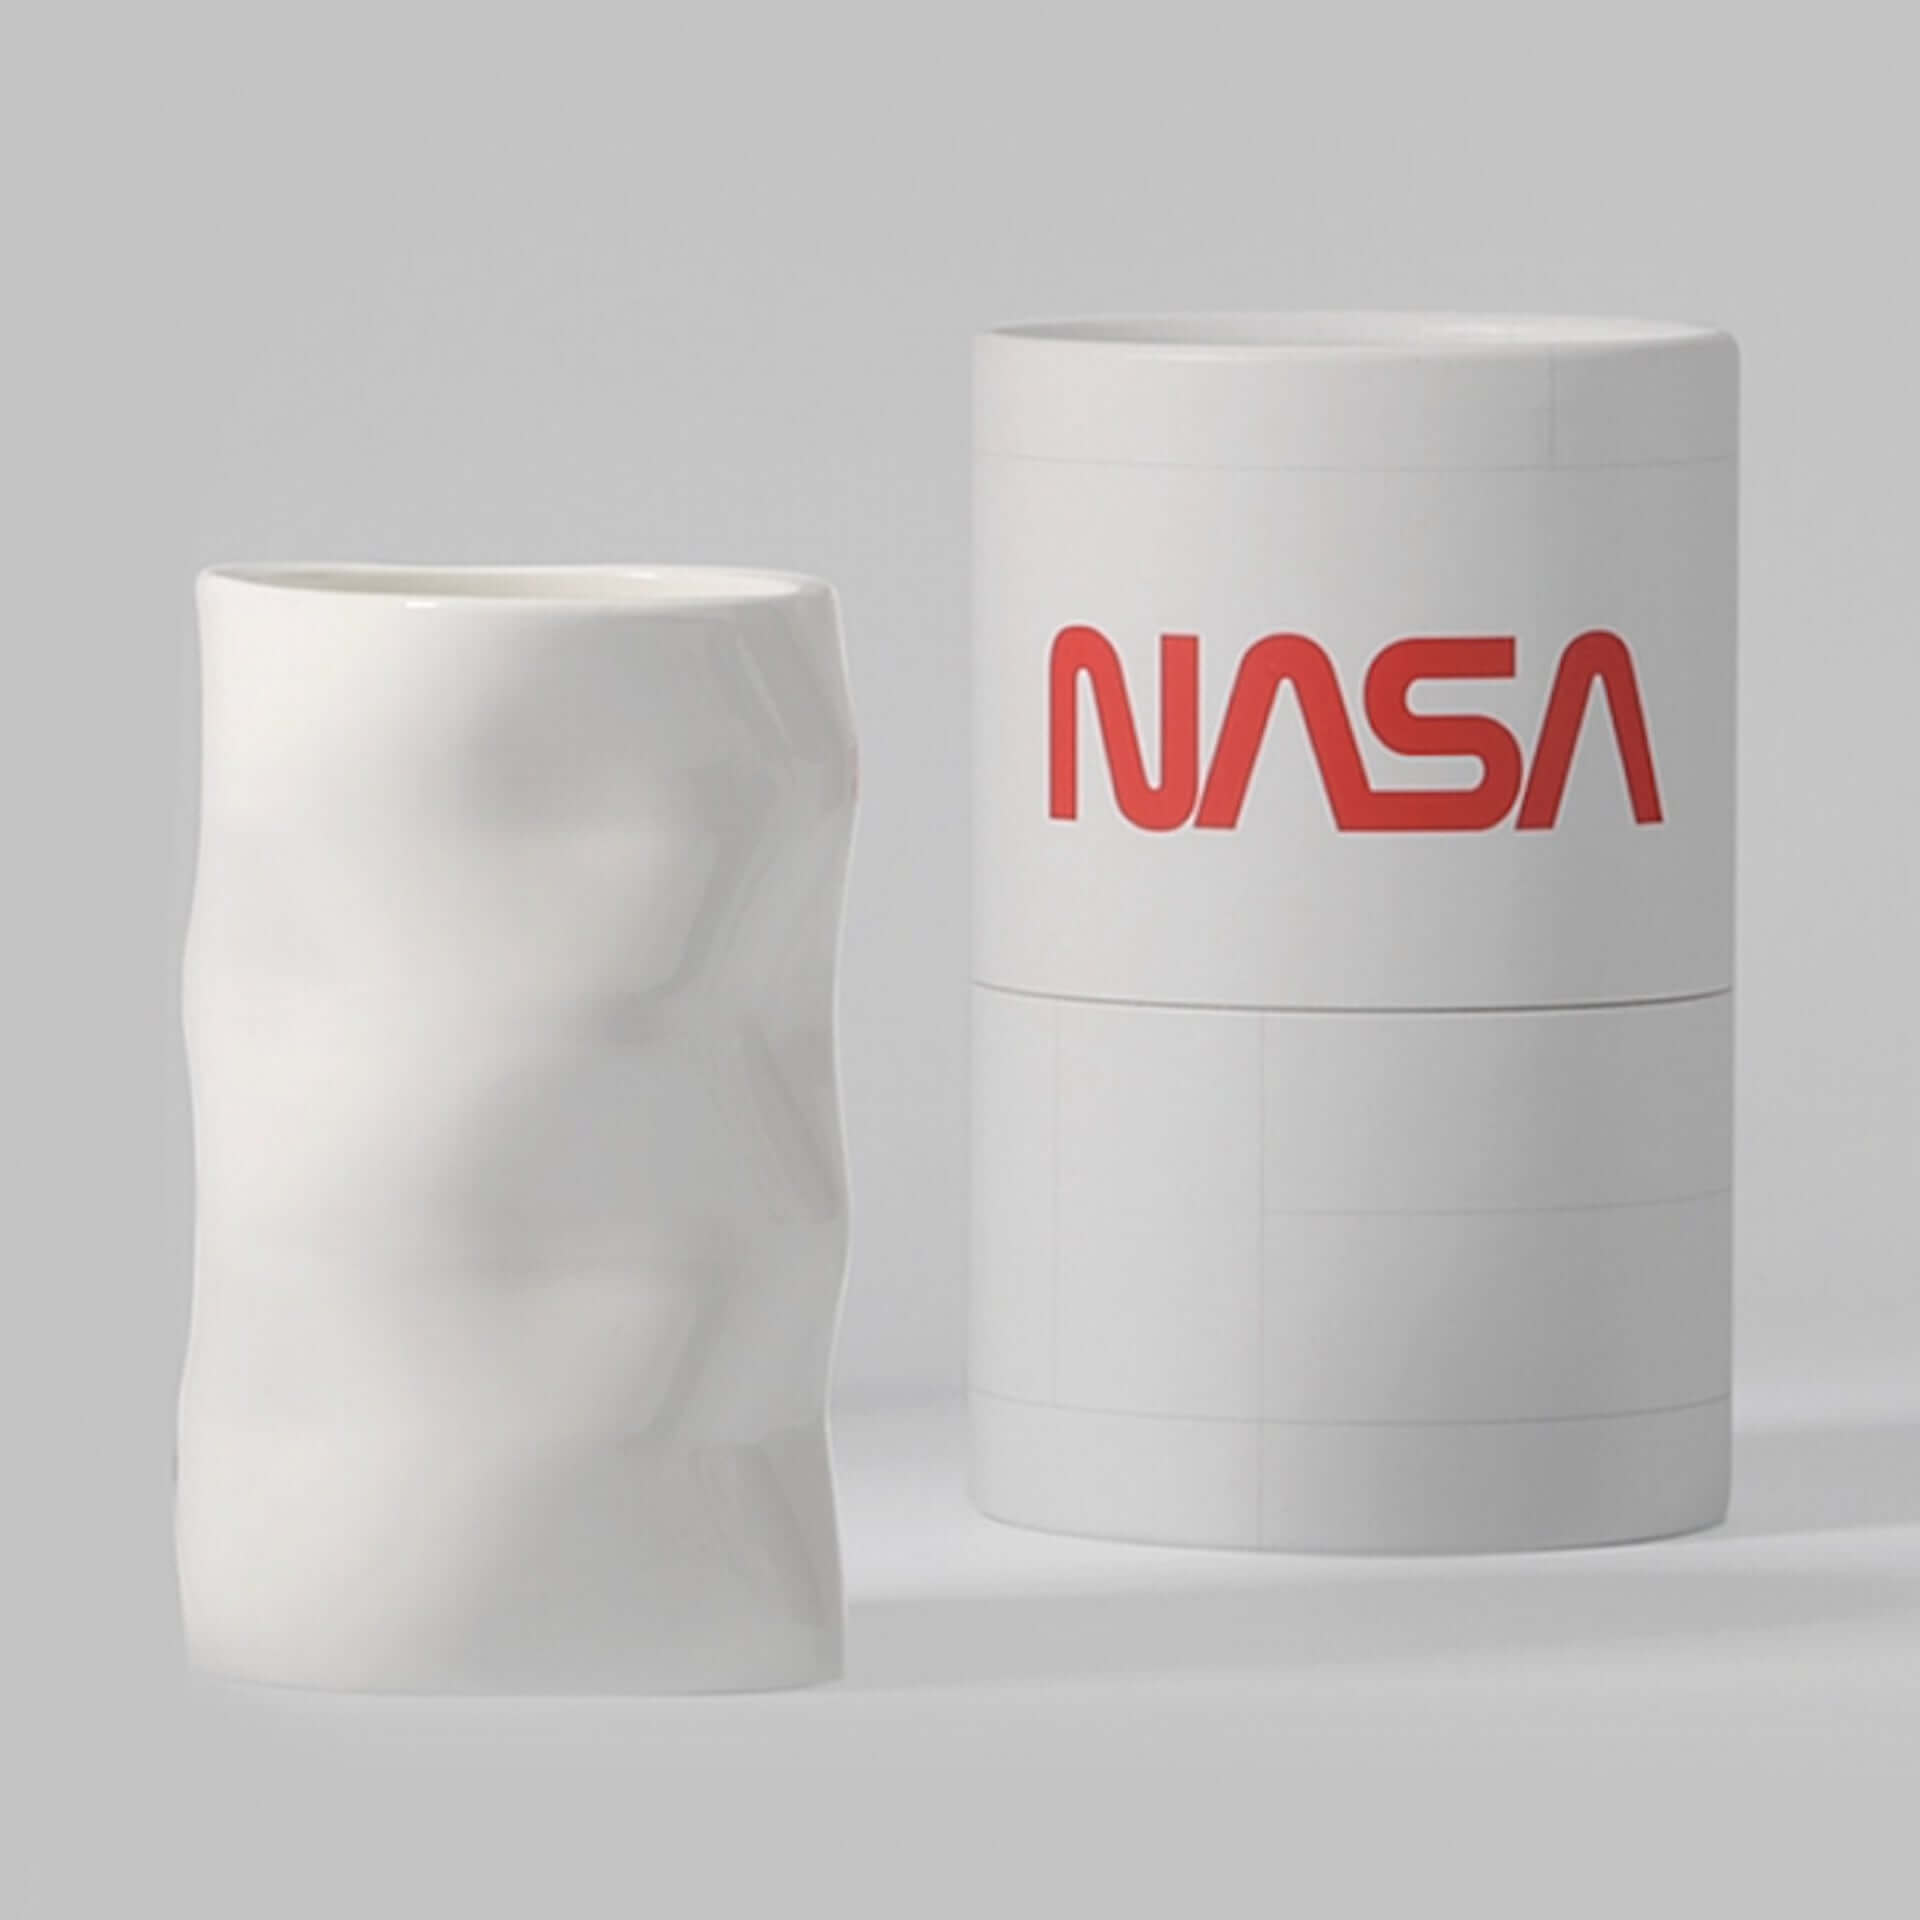 NASA公認&設立60周年記念のARマグカップ!宇宙船からの眺めを体験できる『Space Mug』がGLOTURE.JPに再入荷 tech200729_gloture_7-1920x1920